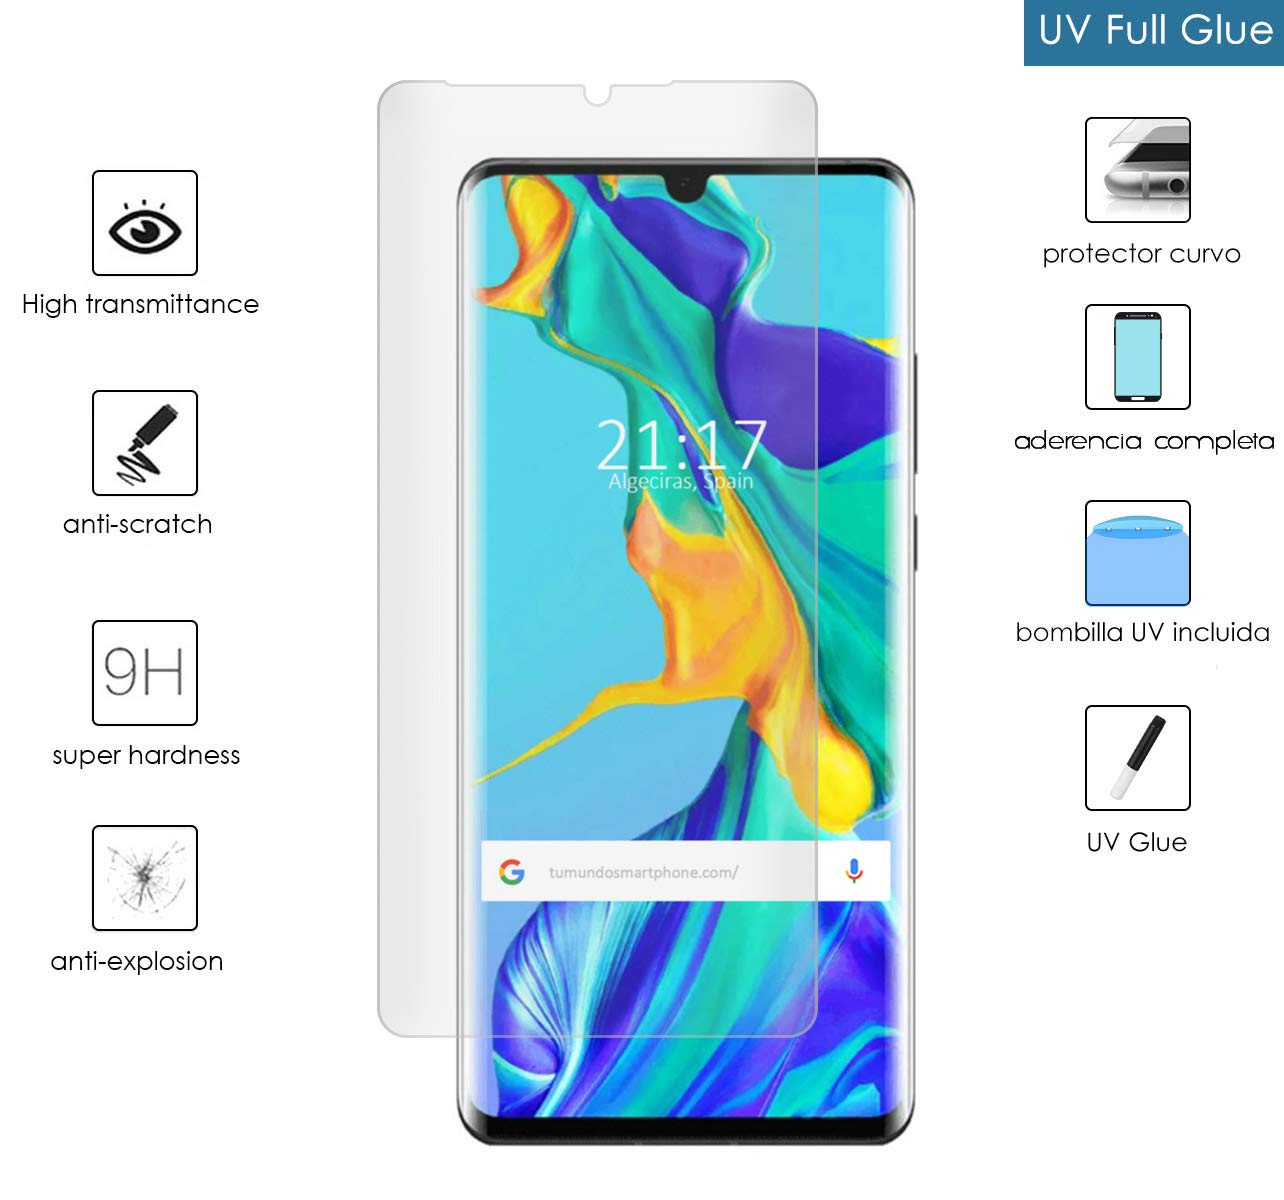 Protector Cristal Templado Completo Curvo UV Full Glue para Huawei P30 Pro